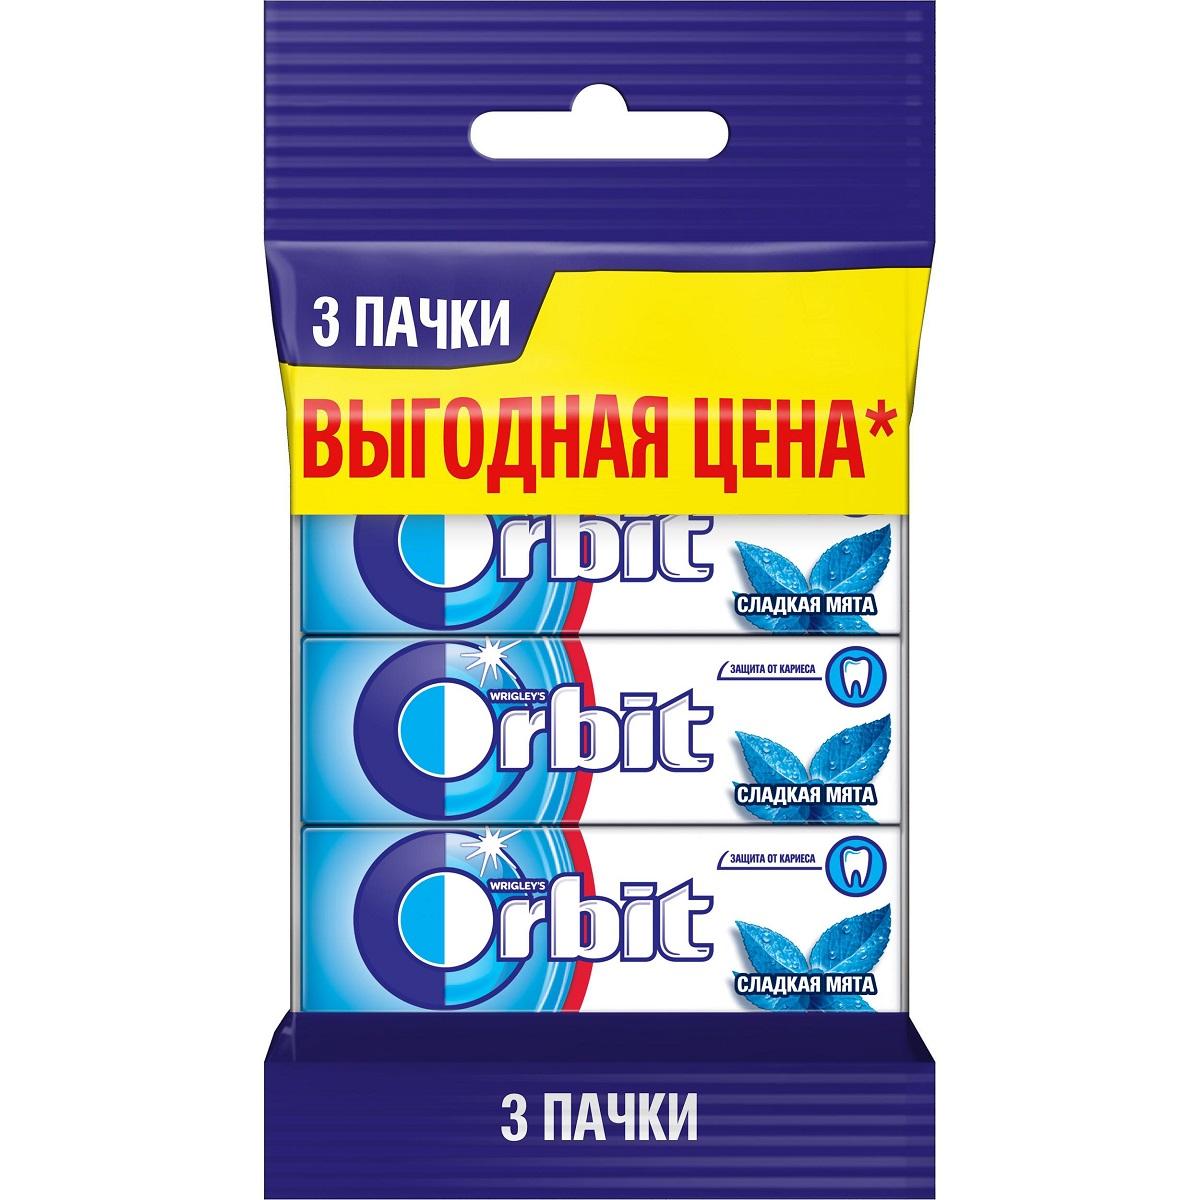 Orbit Сладкая мята жевательная резинка без сахара, 3 пачки по 13,6 г цена